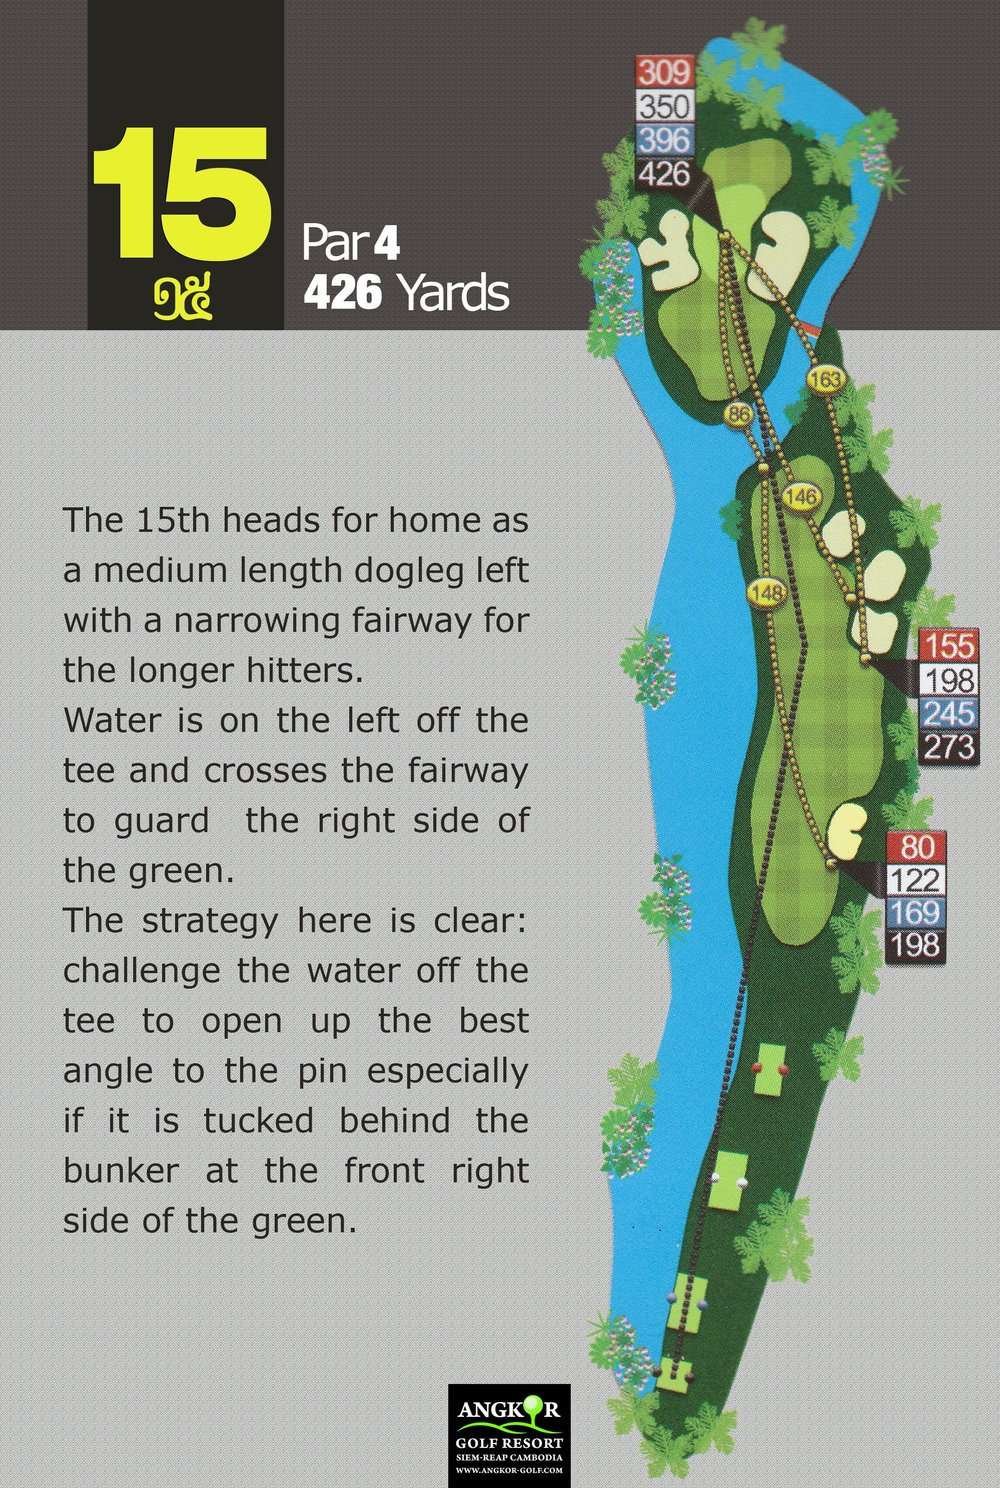 Hole 15 - Par 4 426 Yards